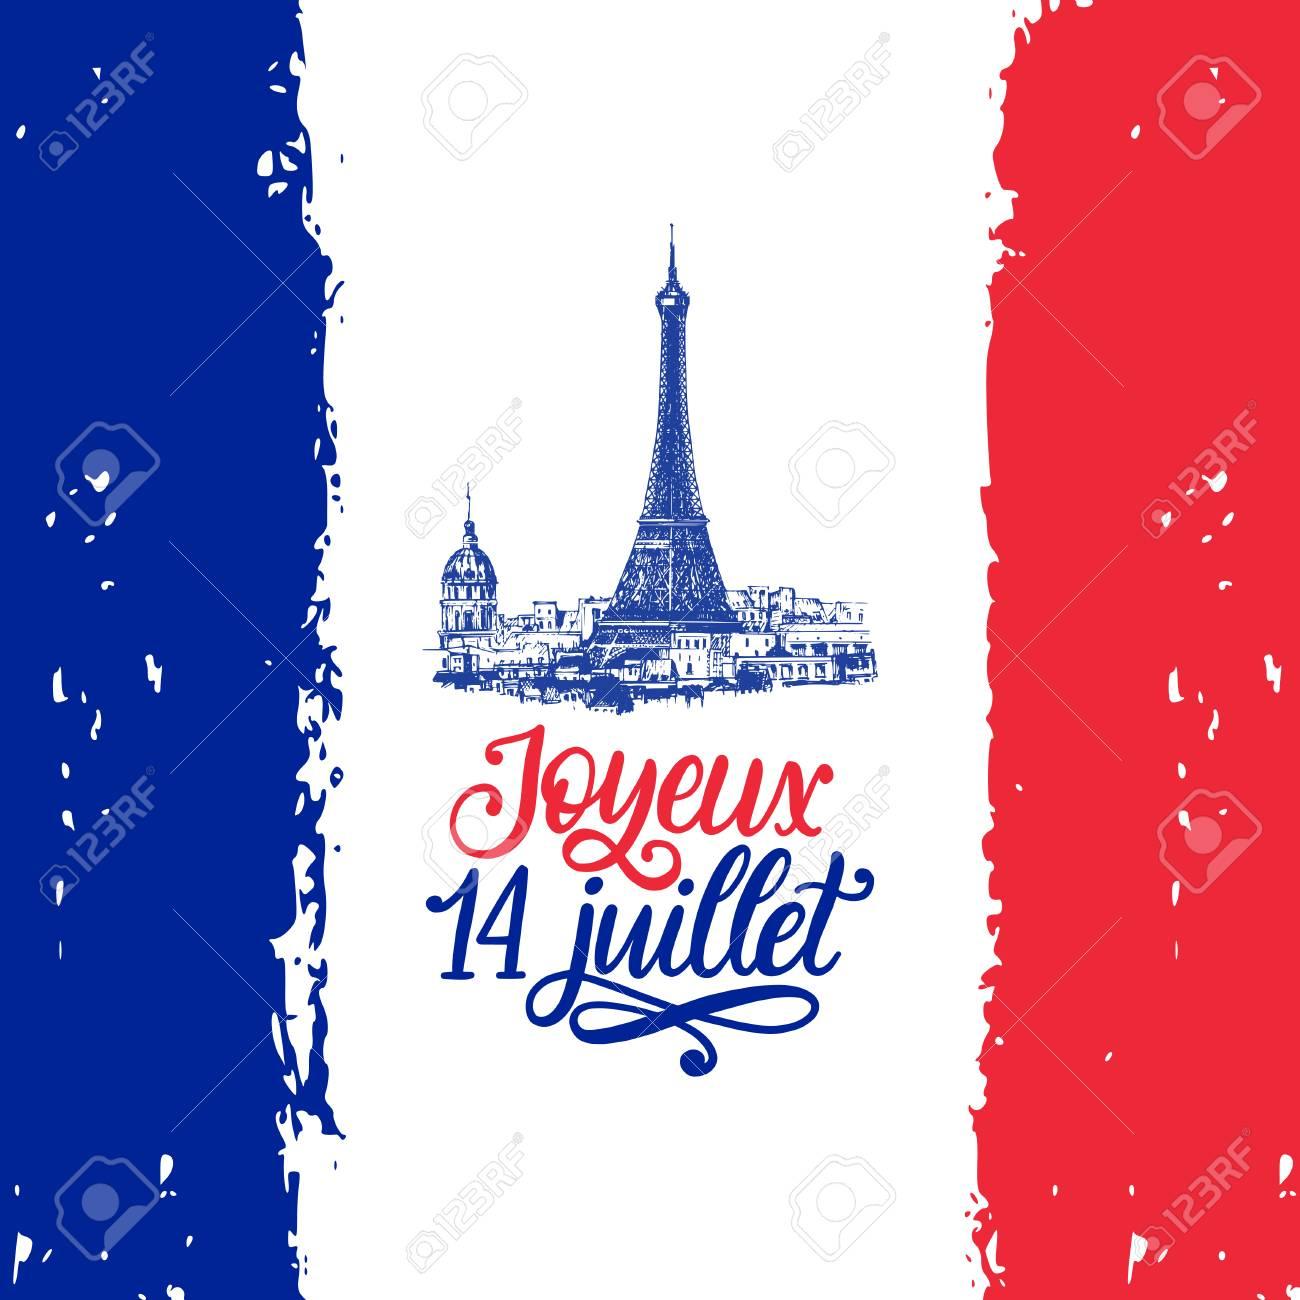 Joyeux 14 Juillet, hand lettering. Phrase translated from French Happy 14th July. Bastille Day illustration. - 103628864